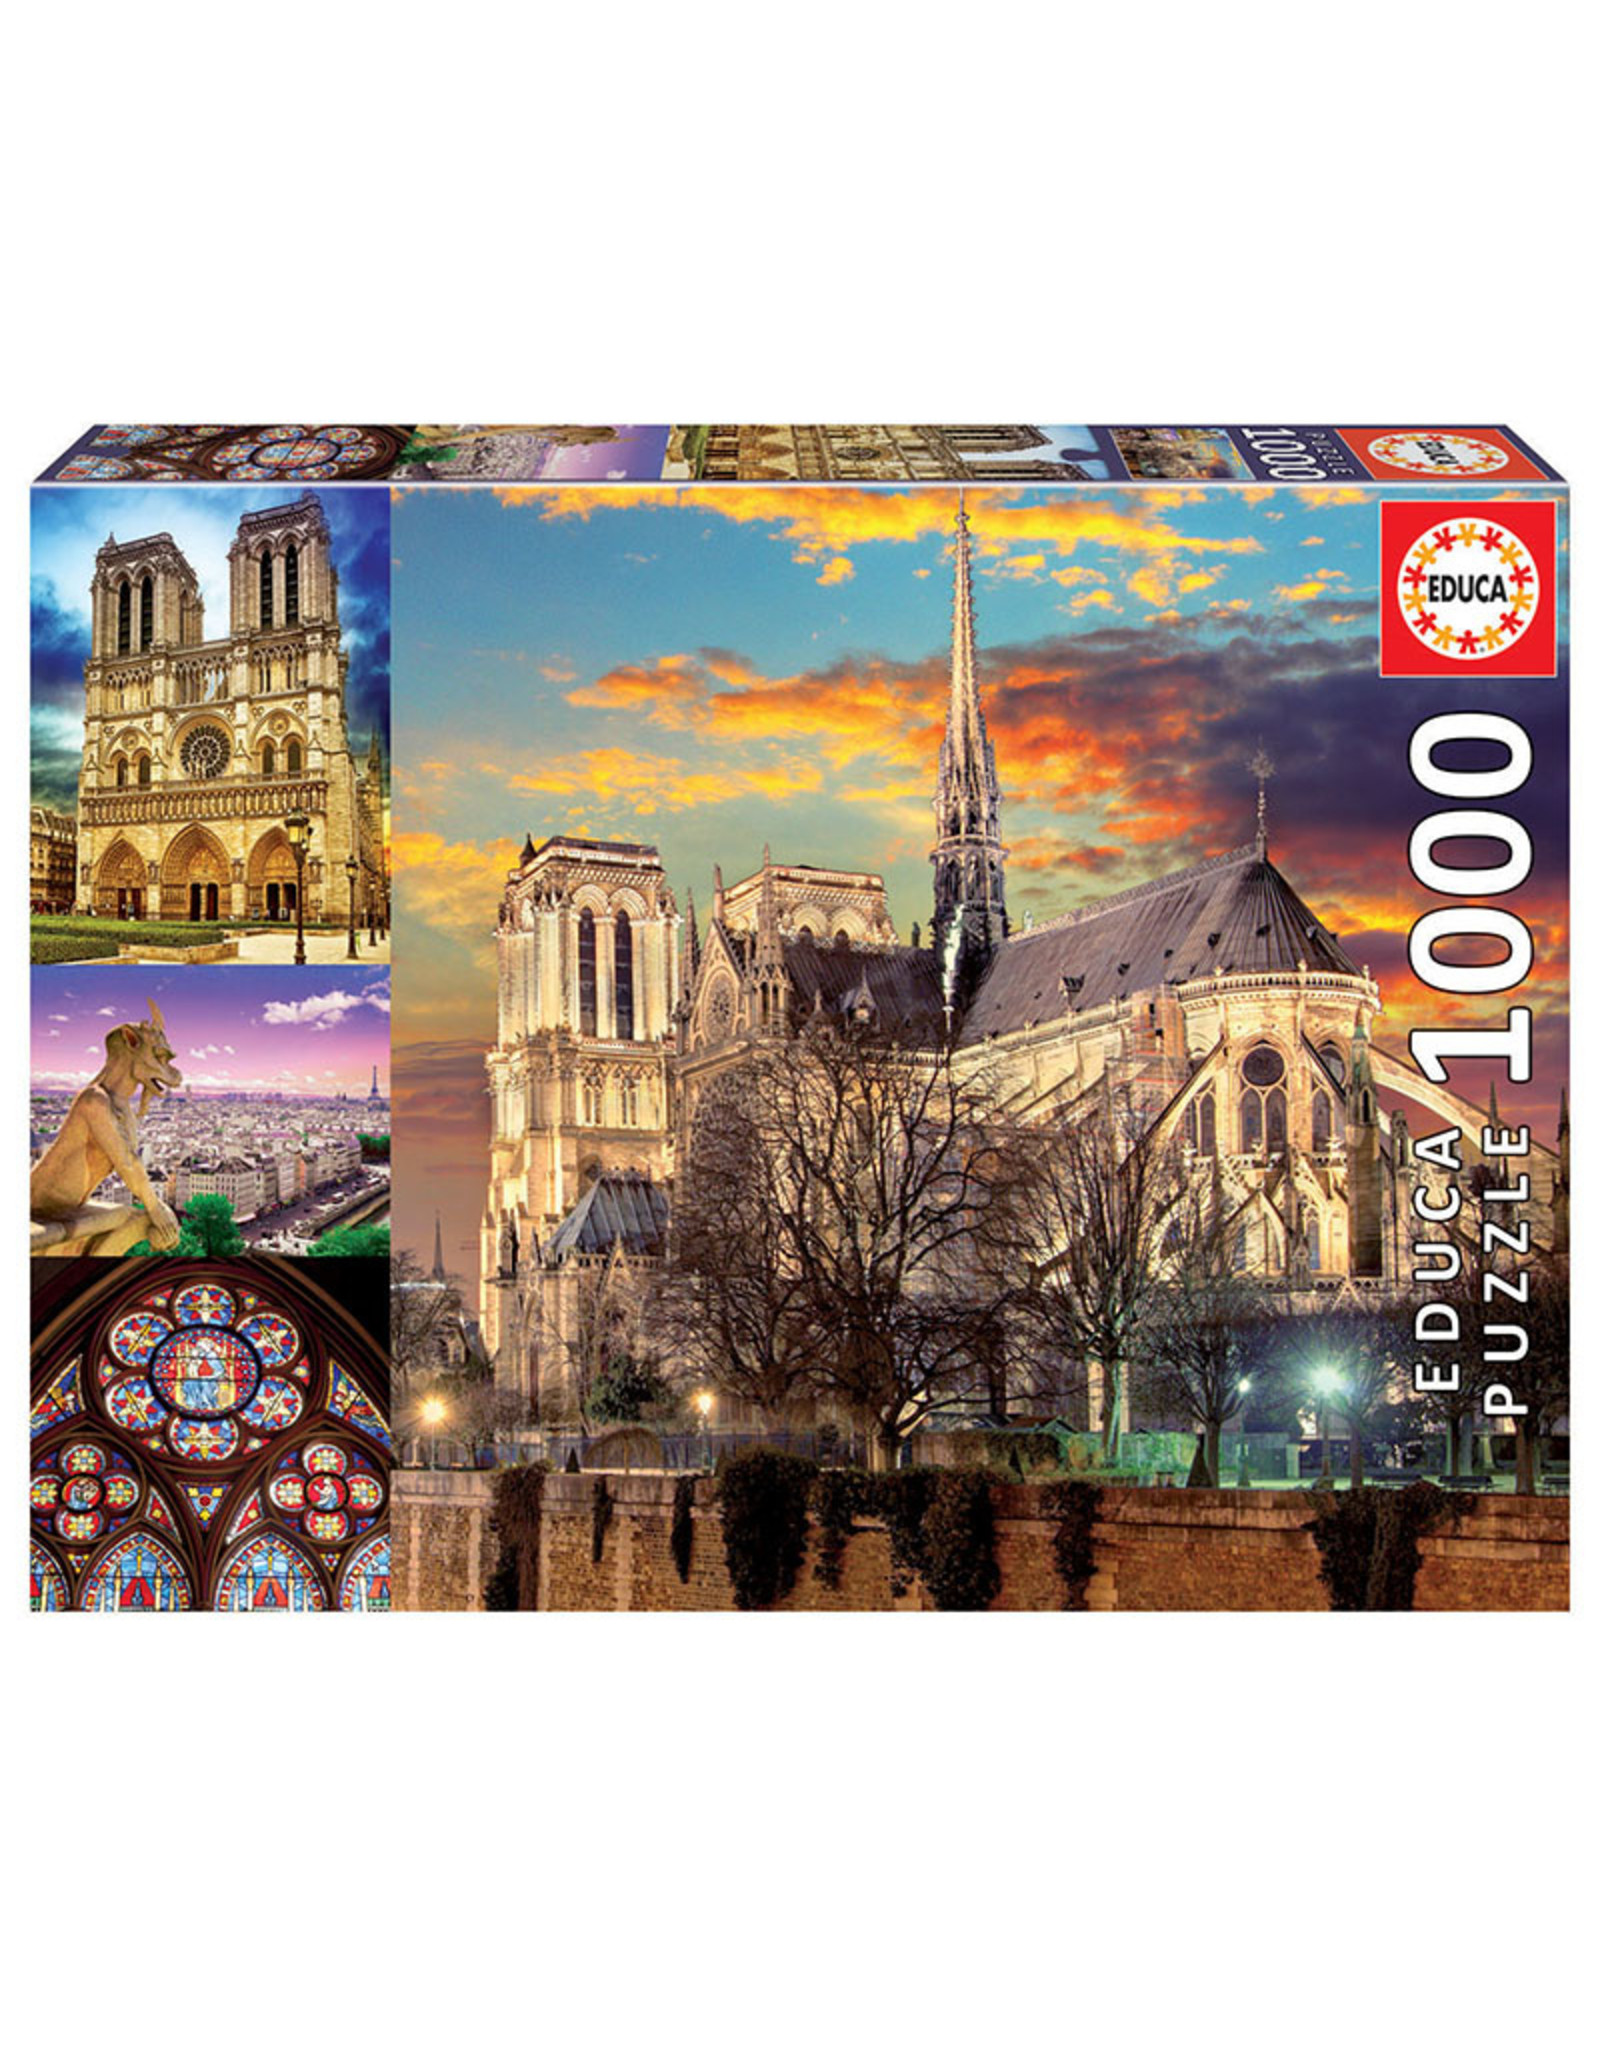 Educa Puzzles Notre Dame Collage 1000pc